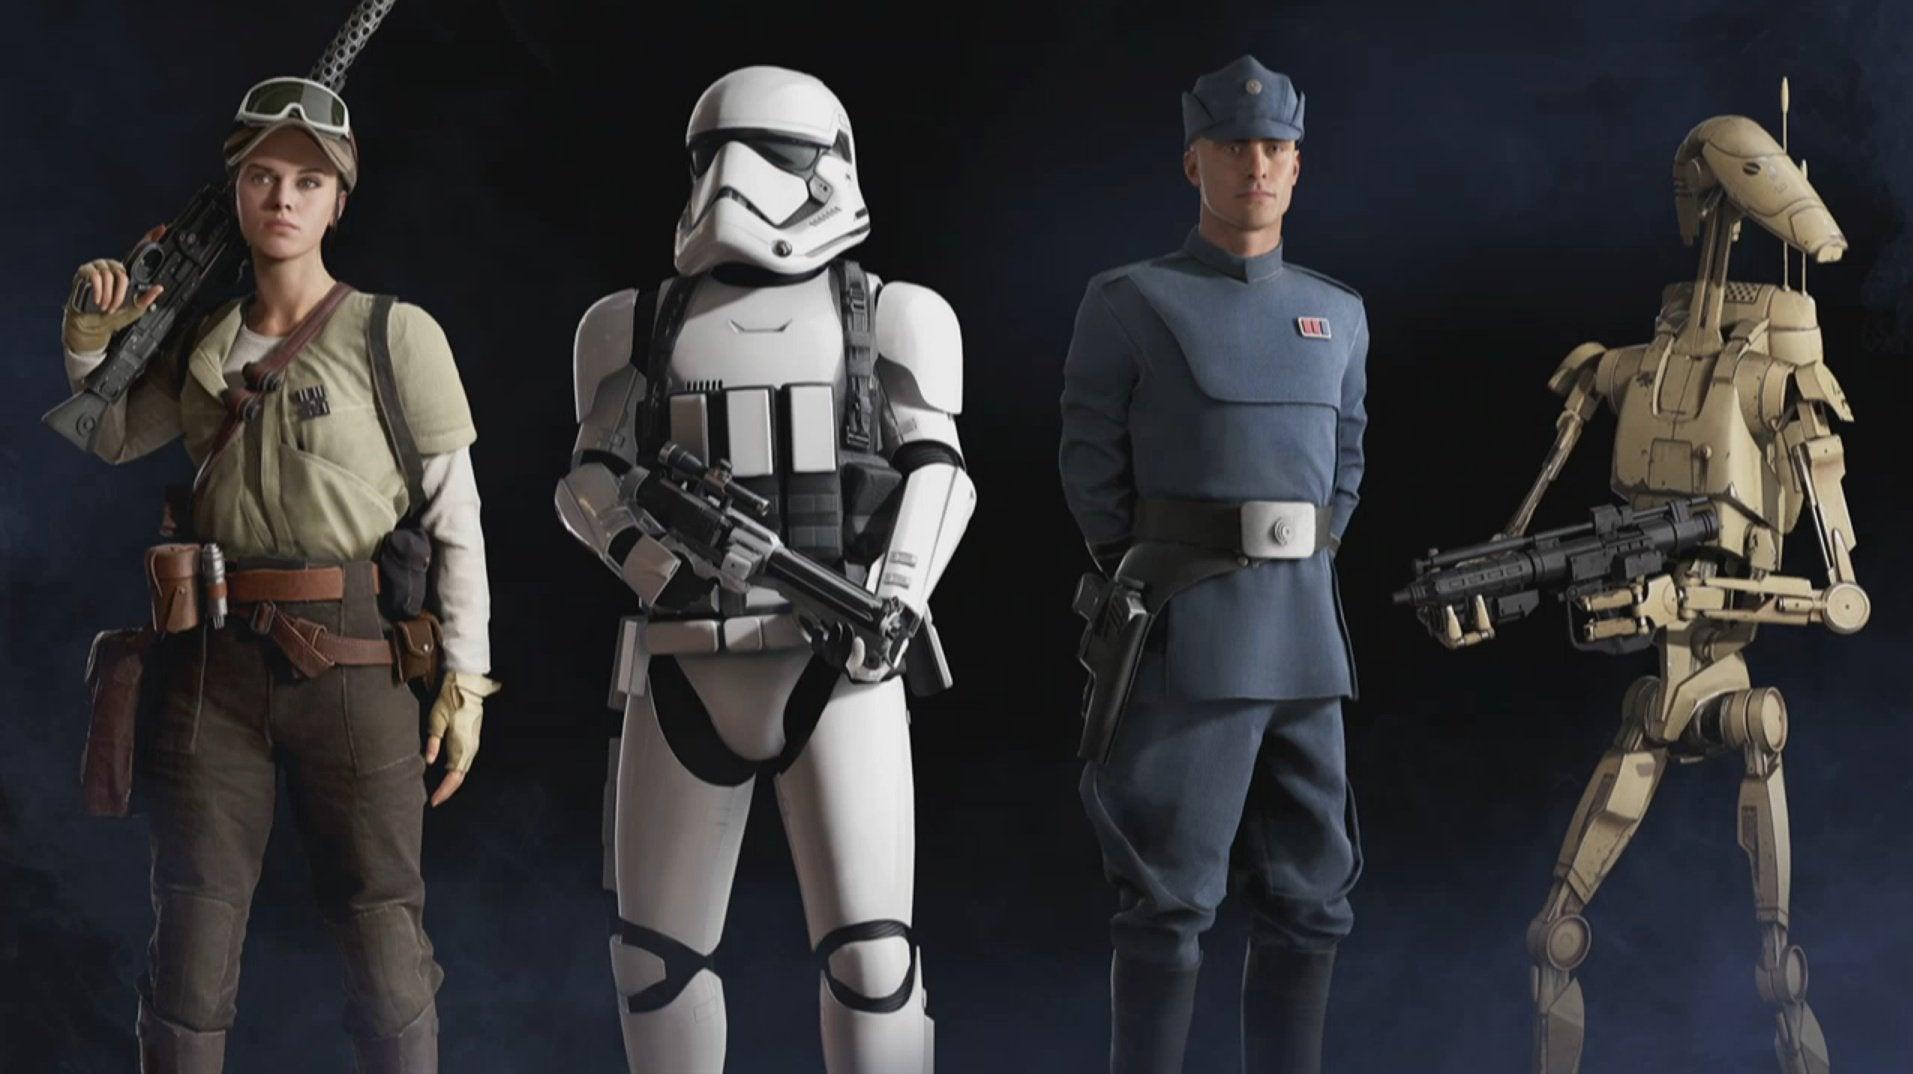 Nude Grievous 2.0 at Star Wars: Battlefront II (2017